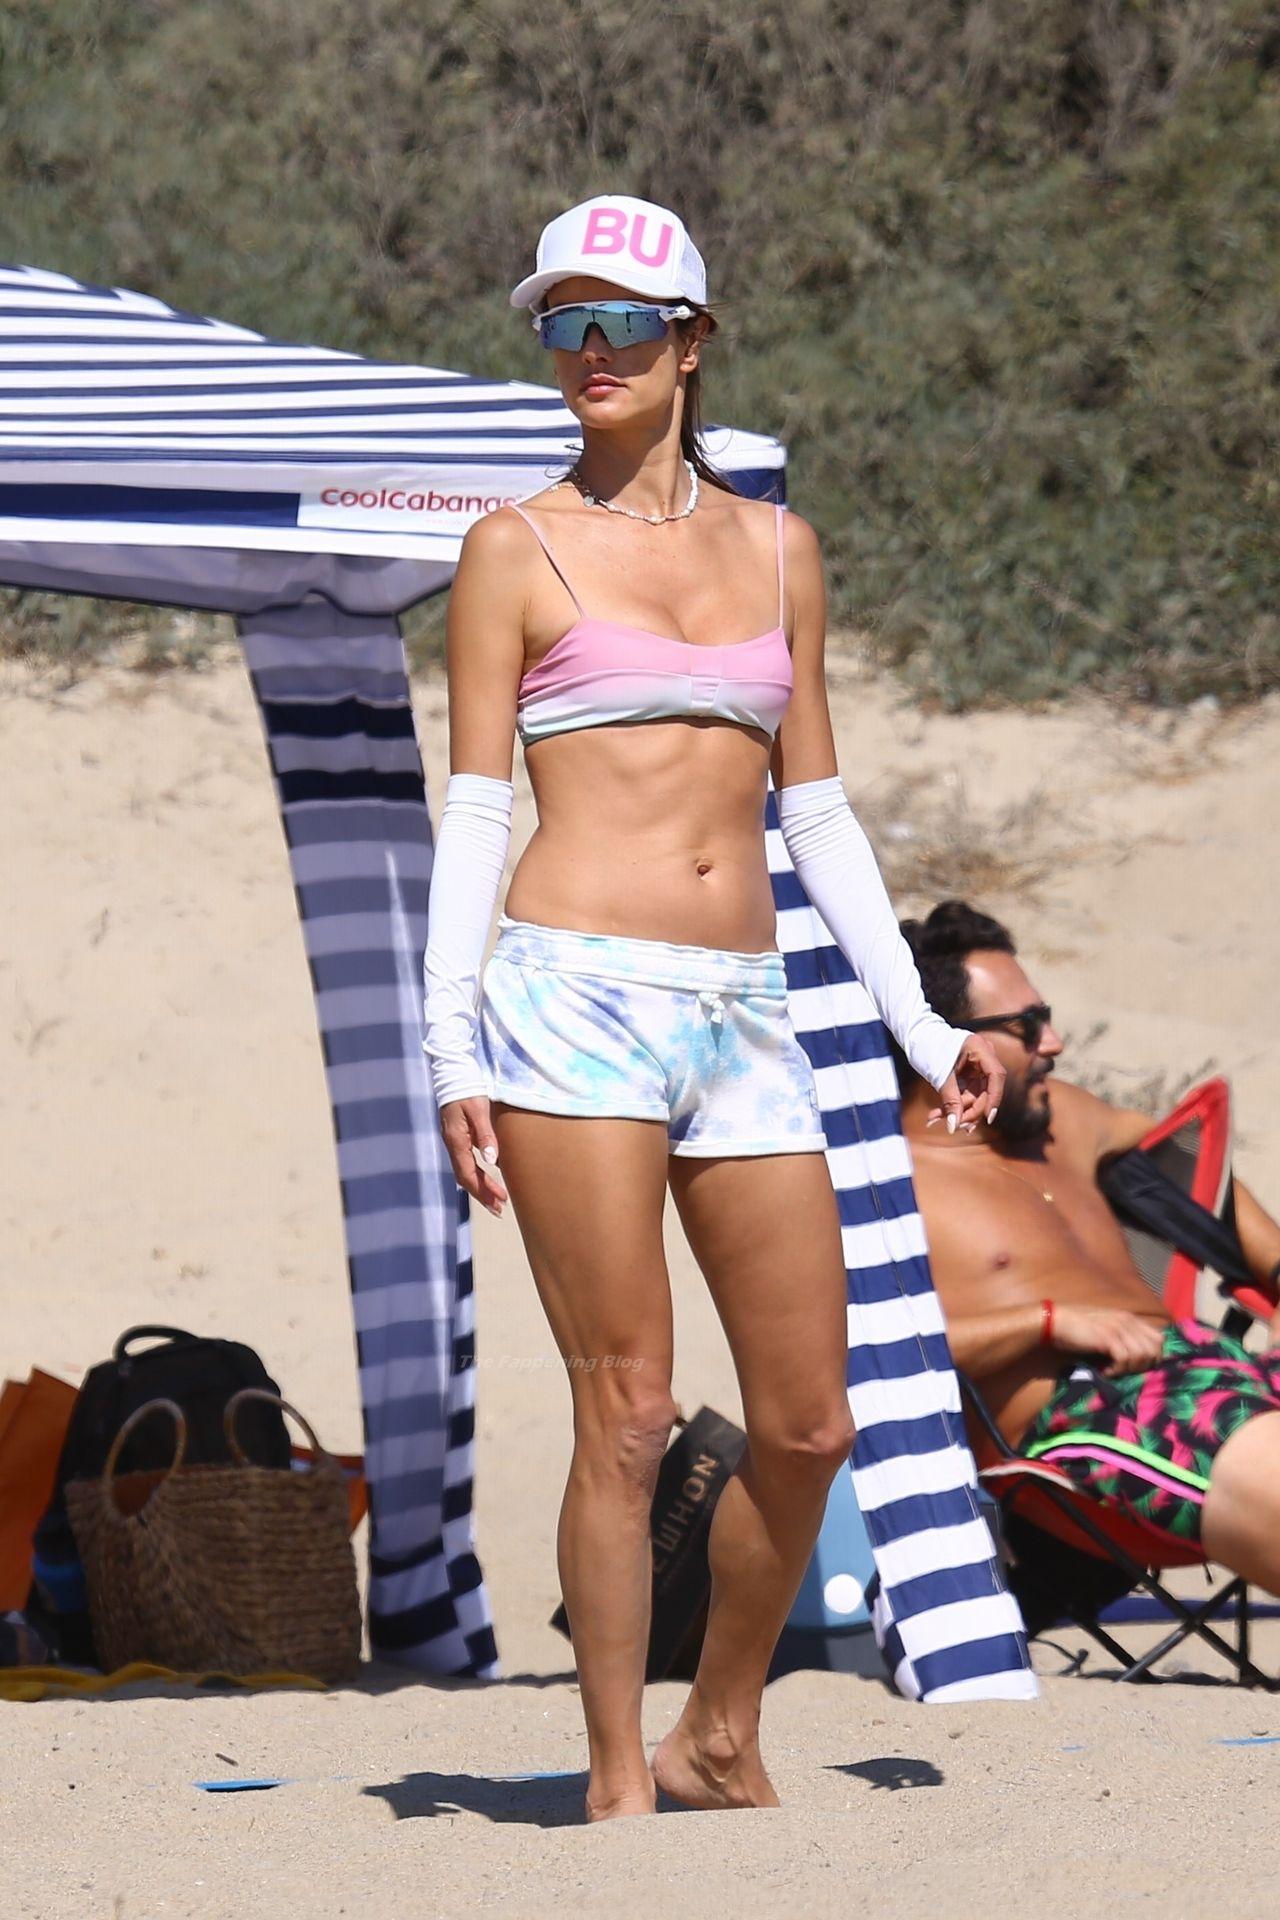 Alessandra-Ambrosio-Sexy-The-Fappening-Blog-18-1.jpg